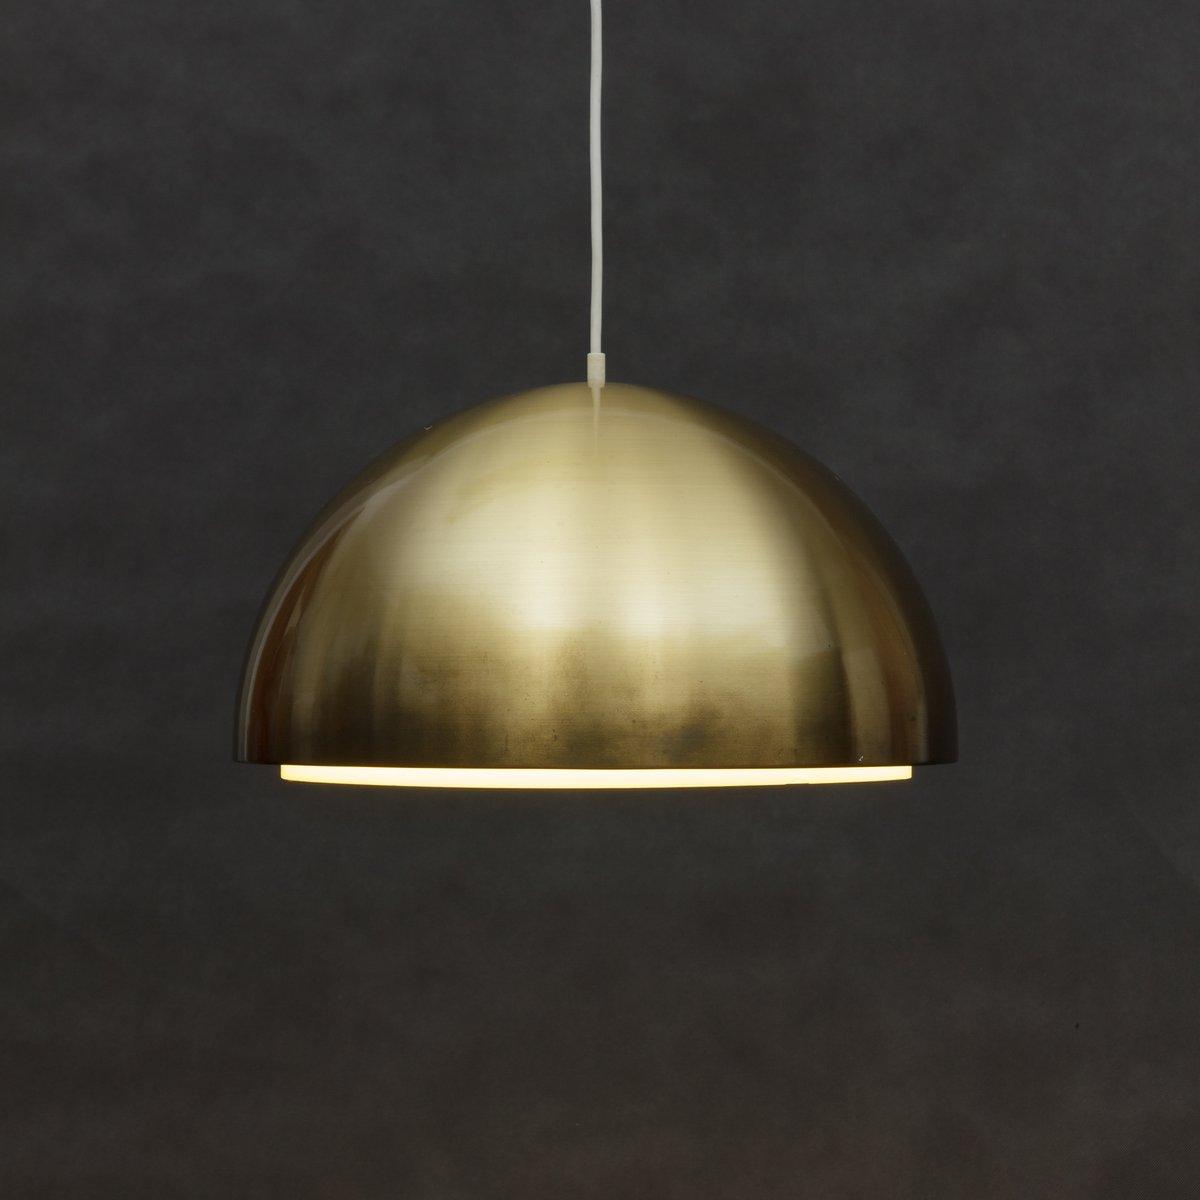 Brass Lamp By Vilhelm Wohlert U0026 Jørgen Bo For Louis Poulsen, 1960s For Sale  At Pamono